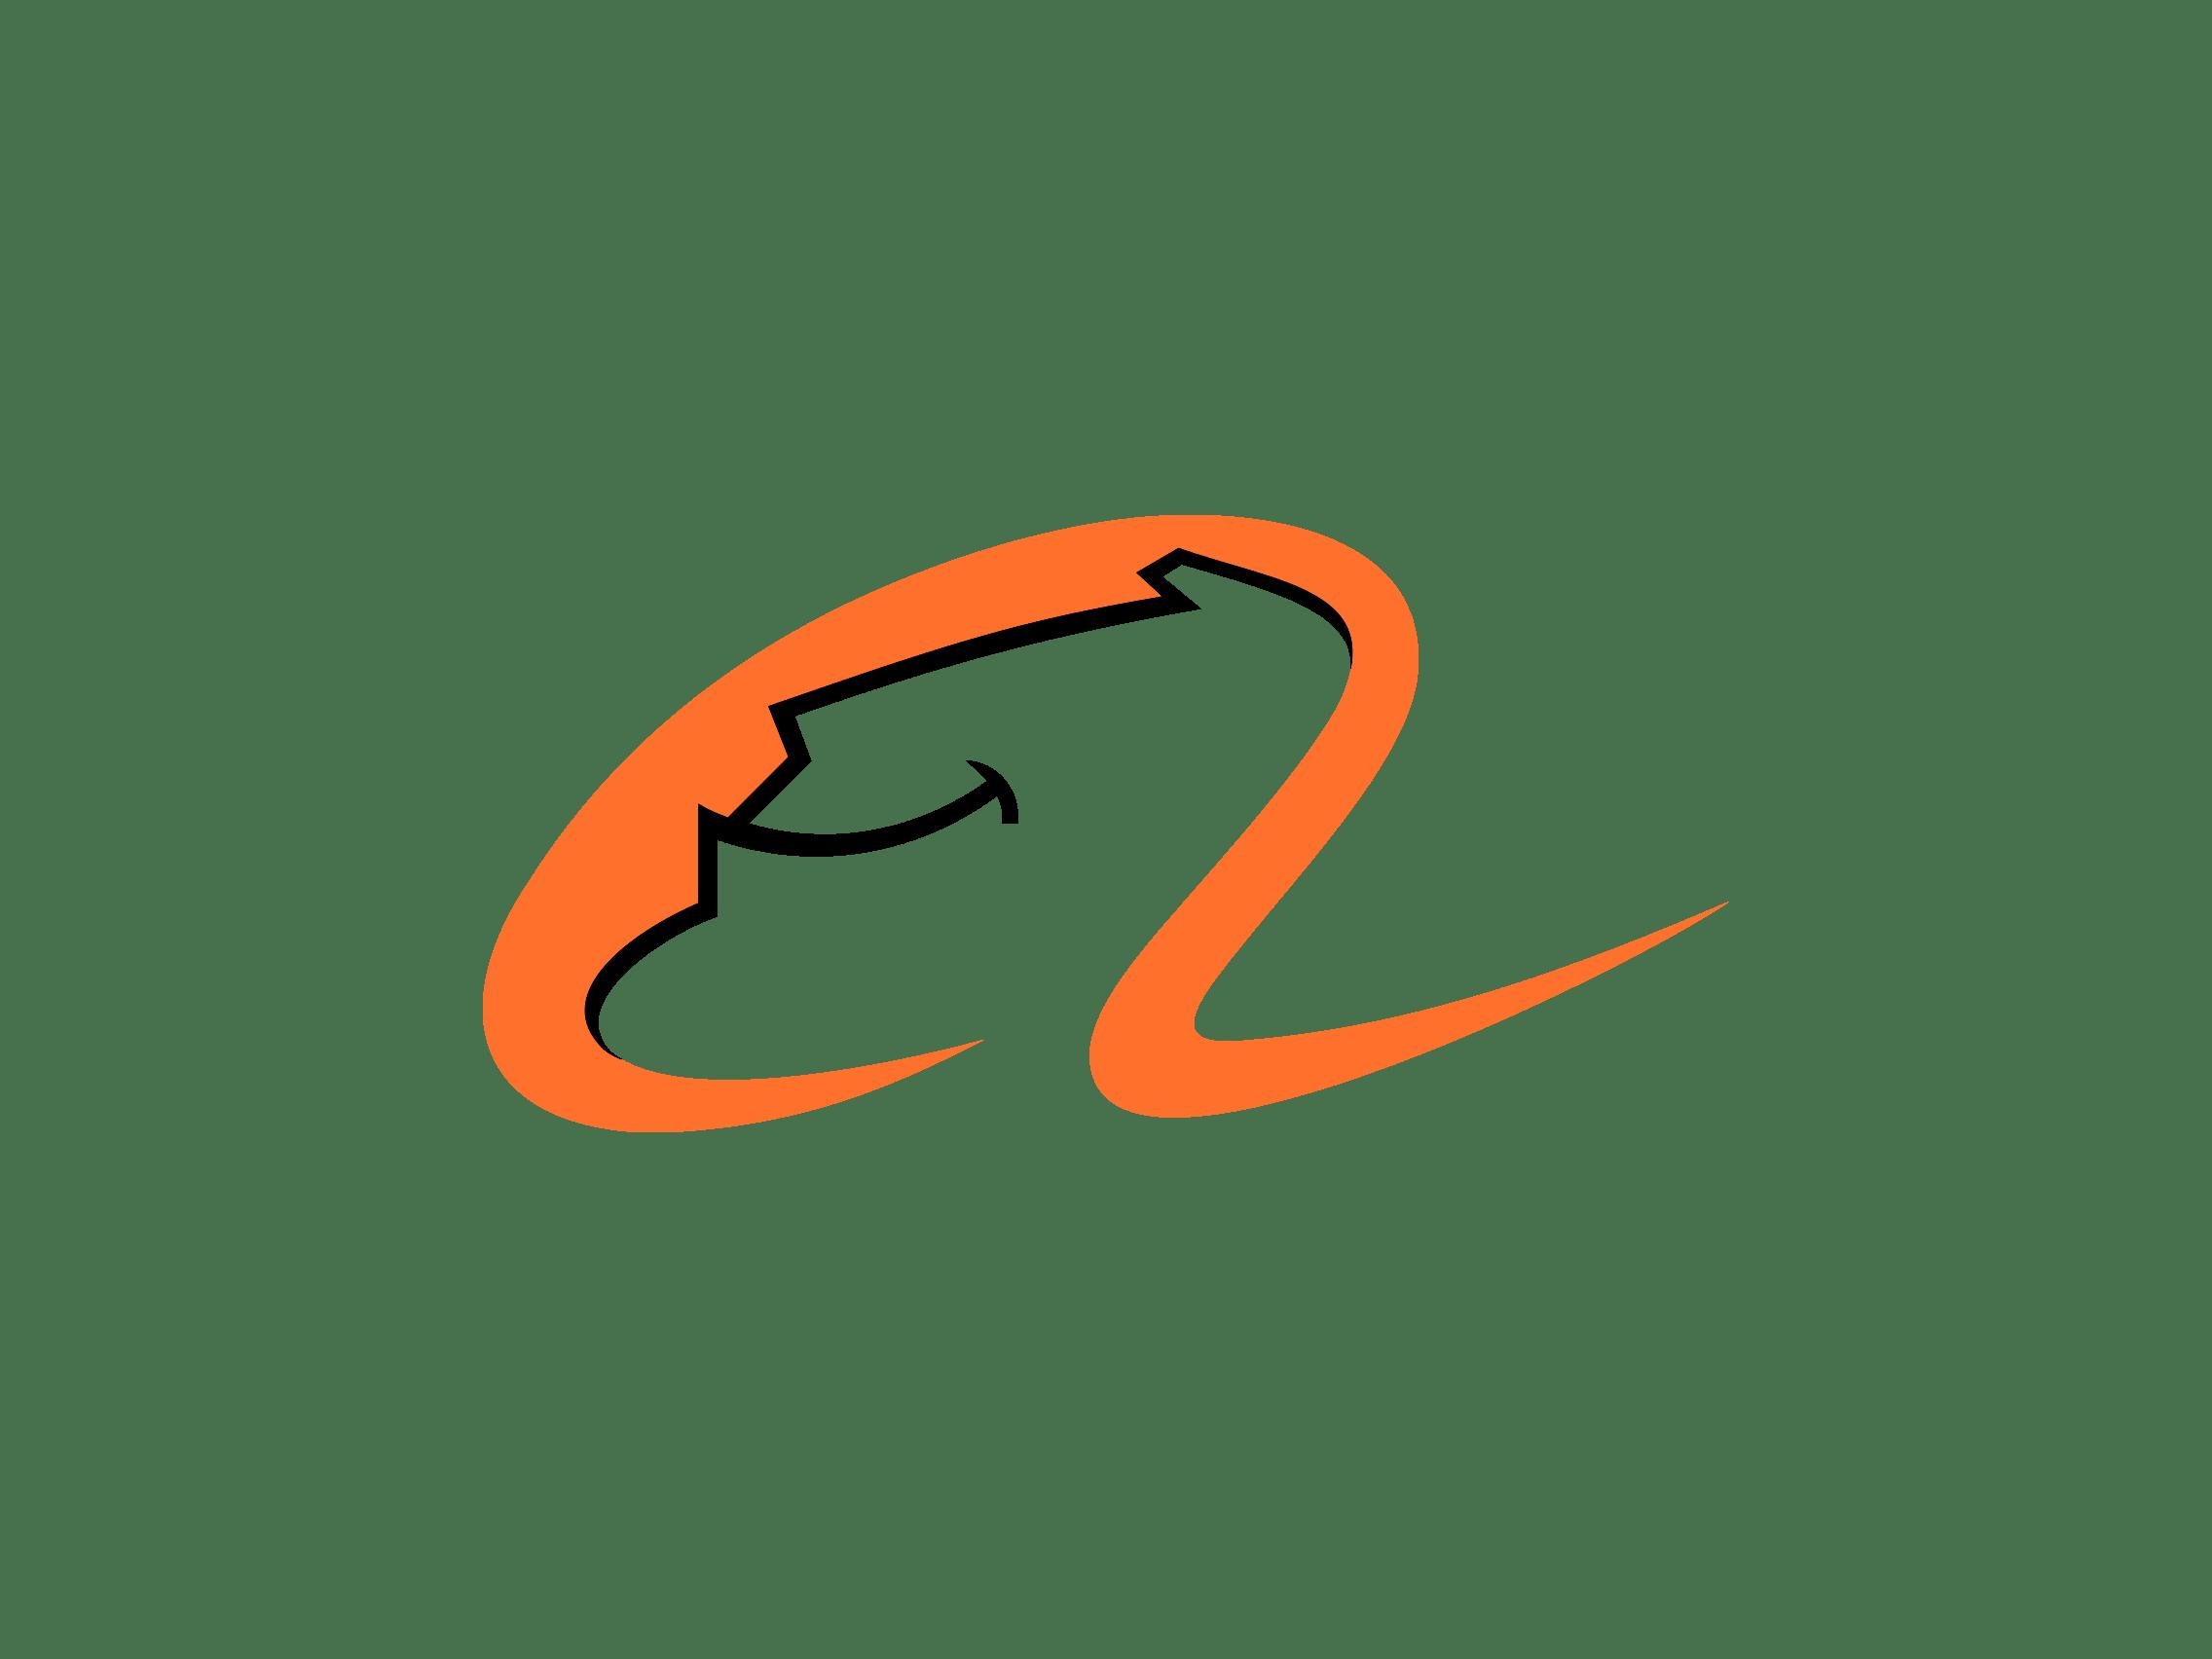 Alibaba Group не сотрудничает с сервисом биткоин-кэшбека